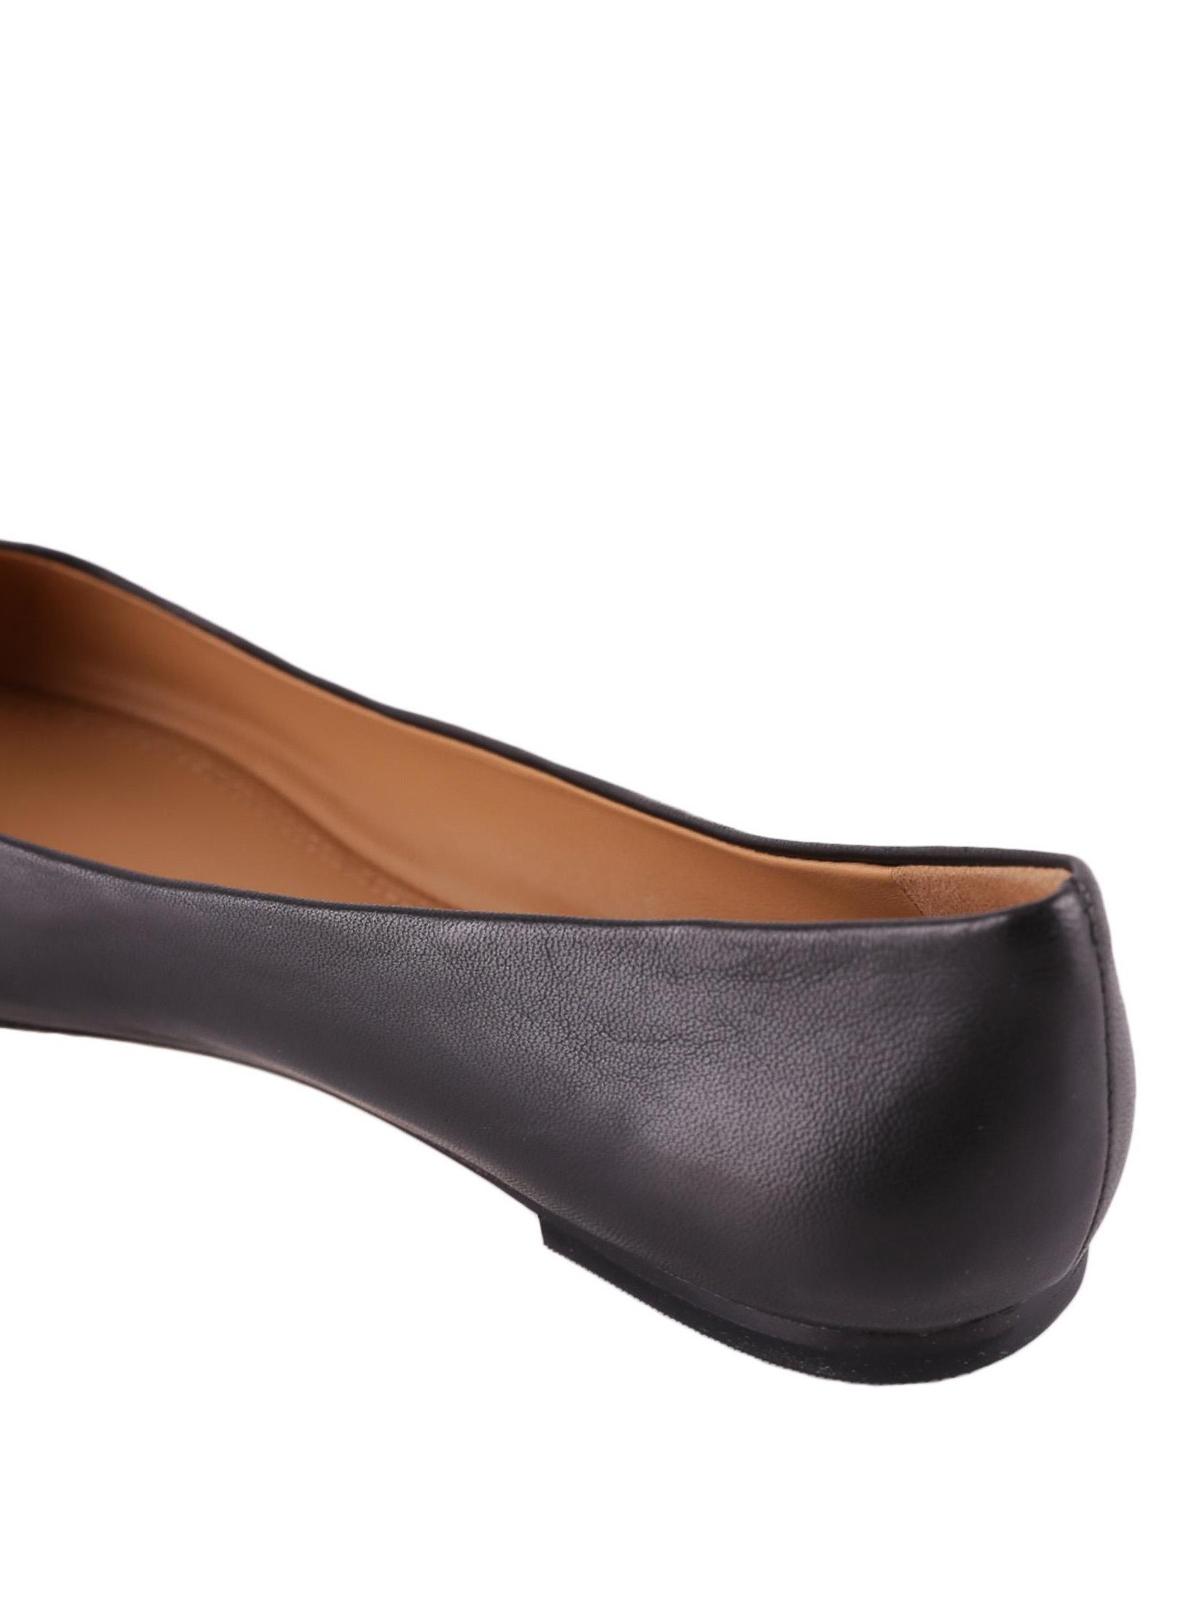 190139208a3a Tory Burch - Chelsea black nappa flats - flat shoes - 46882 009